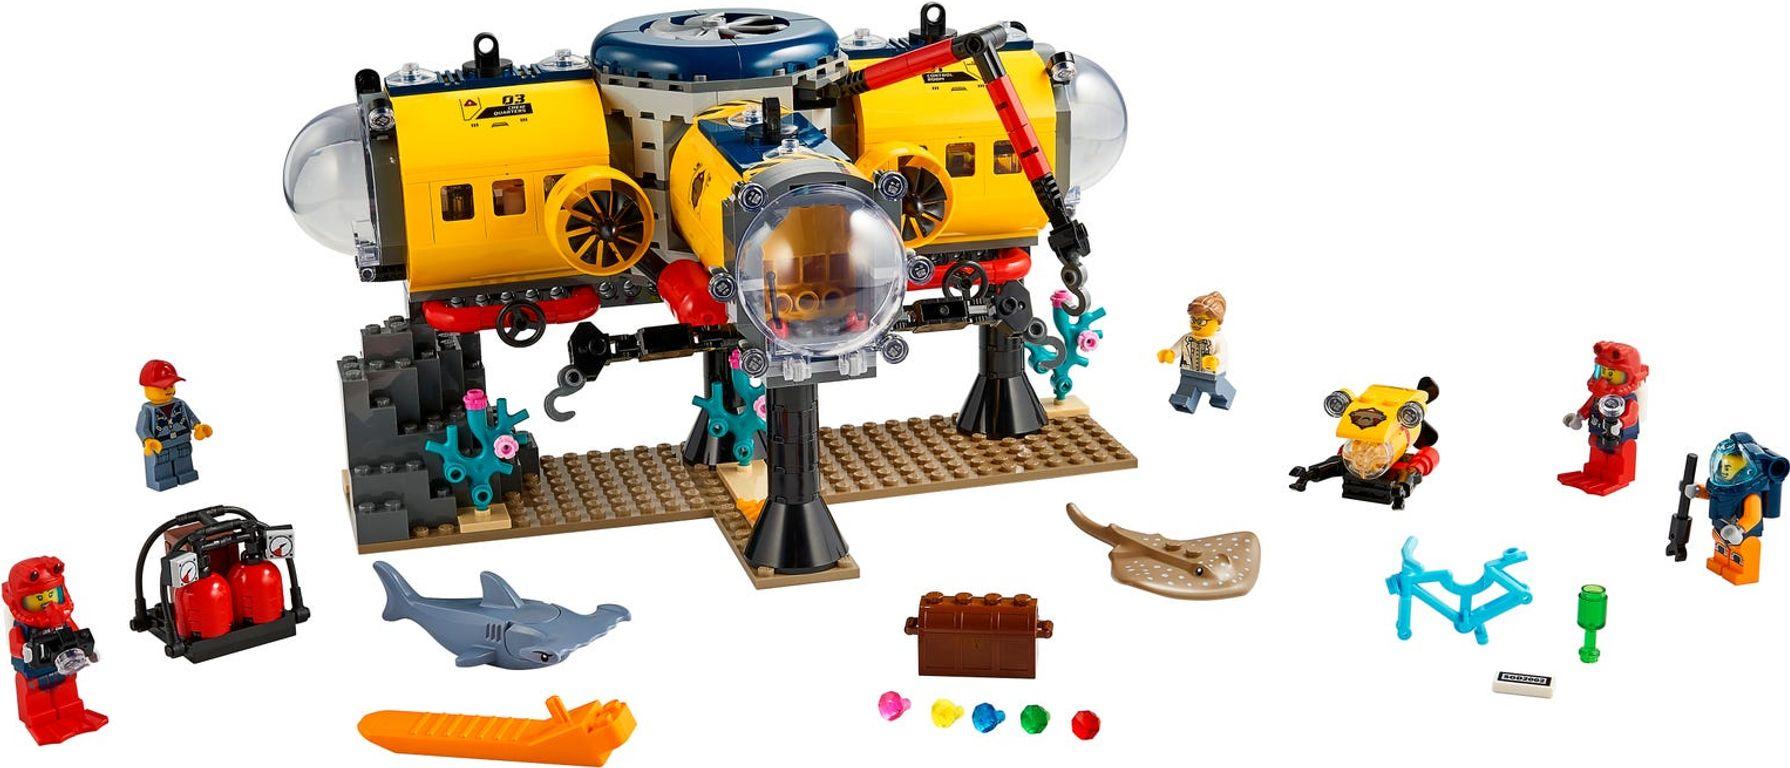 Ocean Exploration Base components